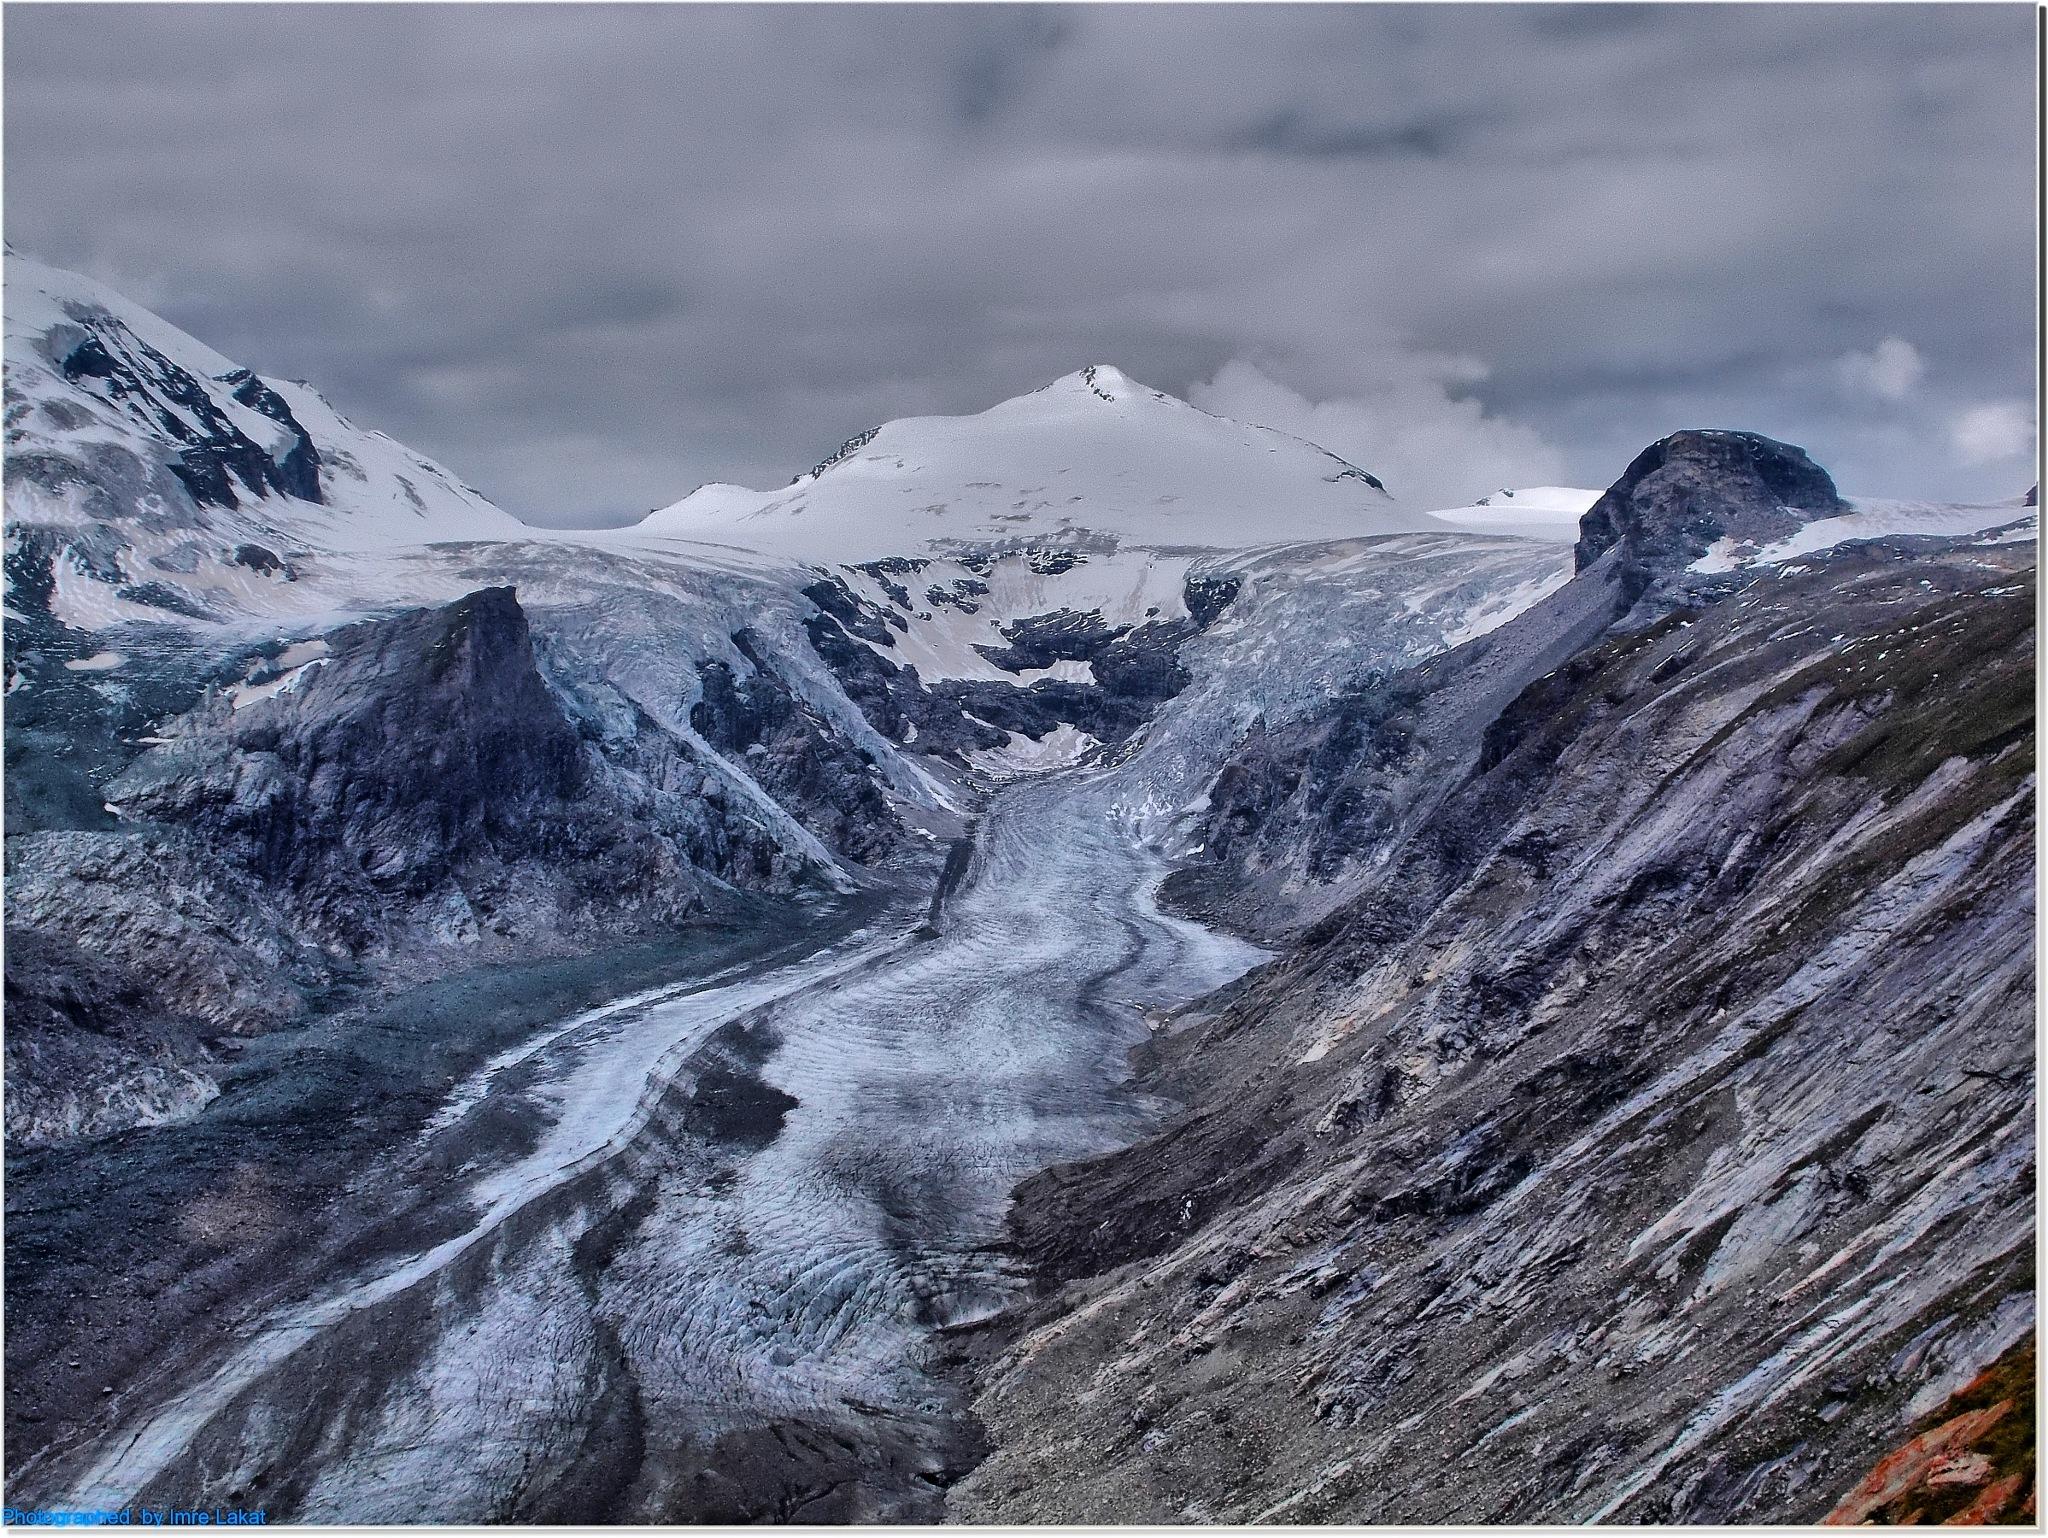 Franz Josef Höhe ...Glacier . Grossglockner Hochalpenstraße Heiligenblut, Austria  by Imre Lakat